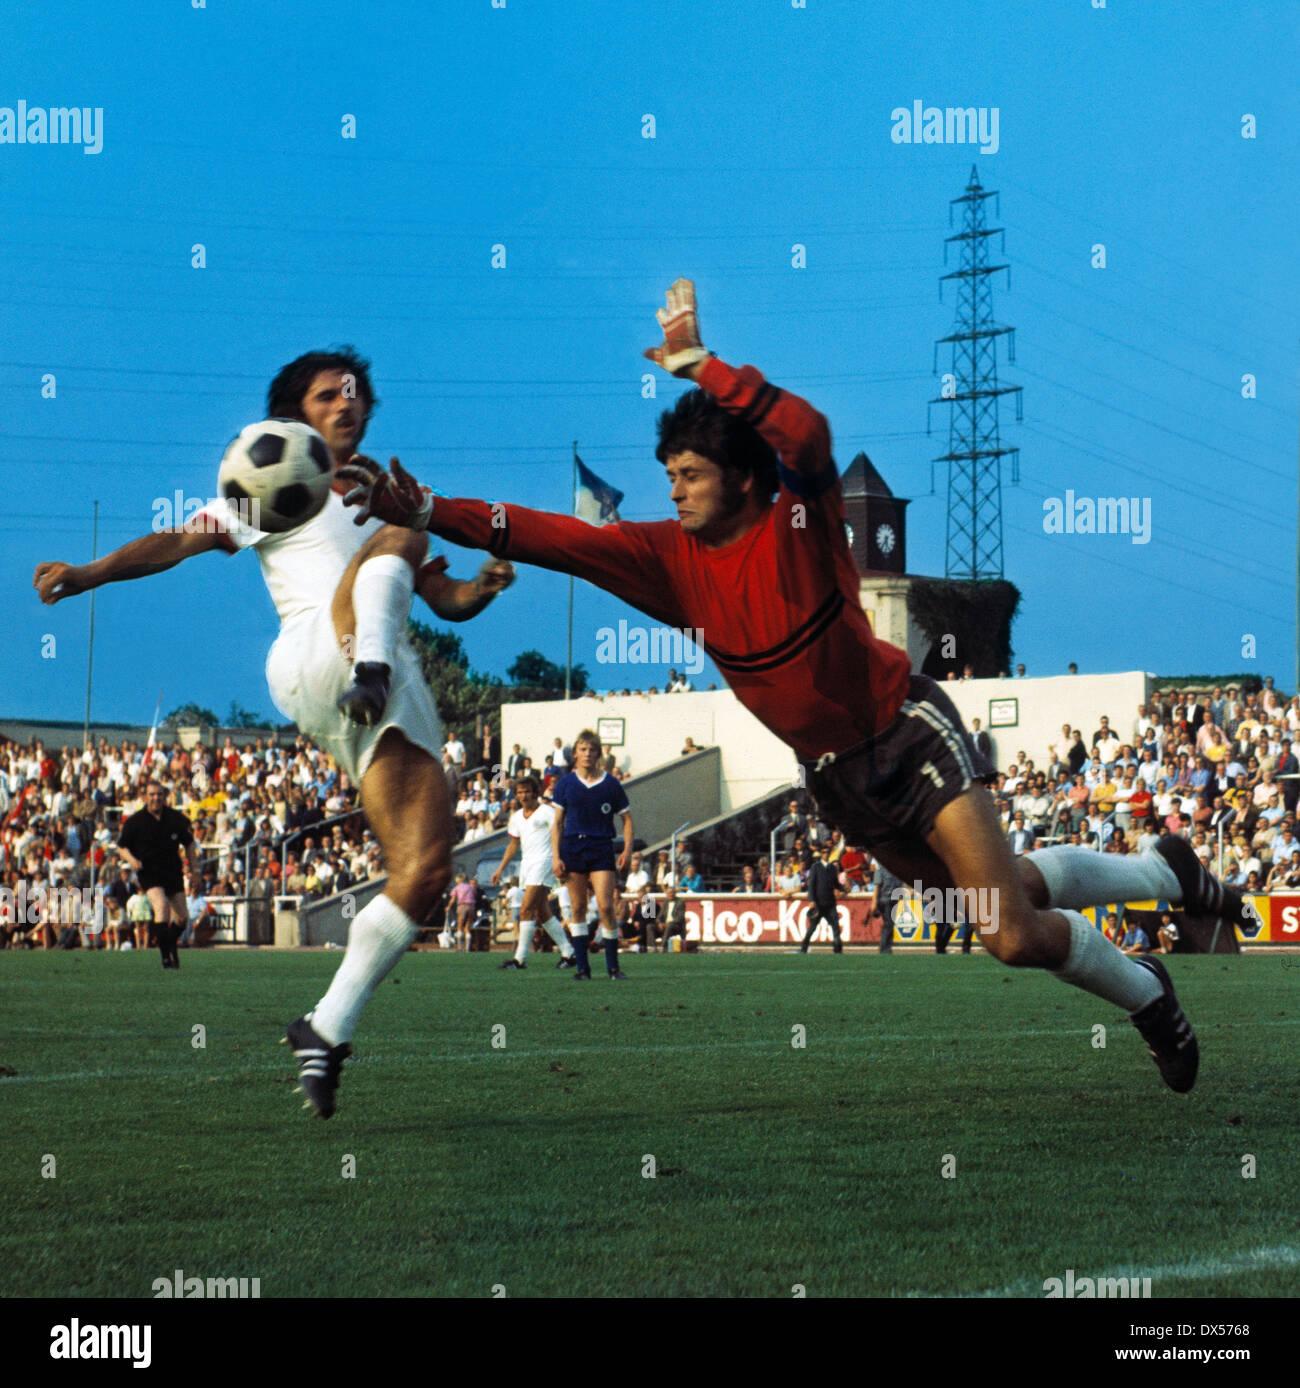 football, Bundesliga, 1970/1971, Niederrheinstadion, Rot Weiss Oberhausen versus FC Bayern Munich 0:4, duel between Gerd Mueller (FCB) left and keeper Wolfgang Scheid (RWO) - Stock Image